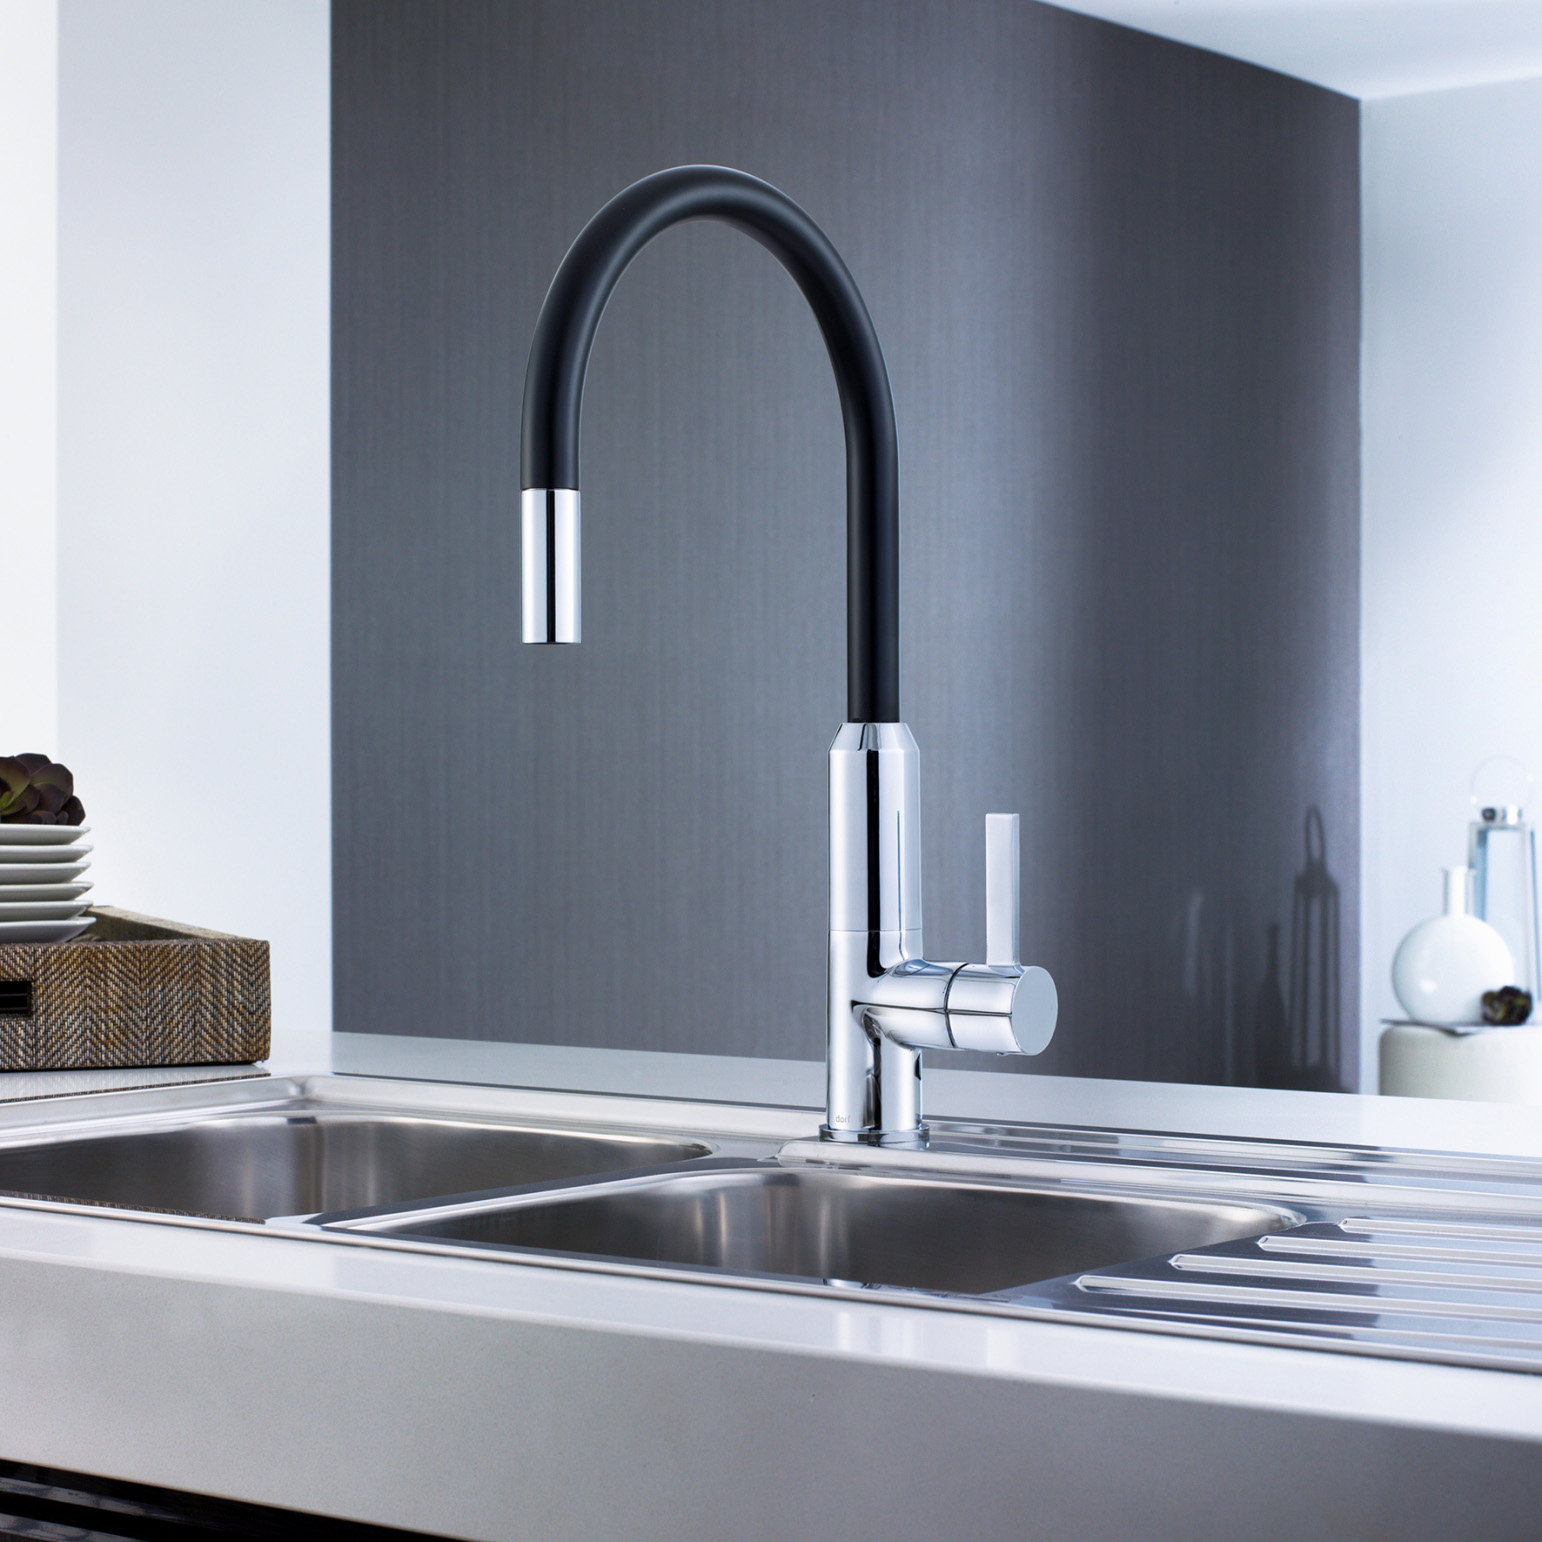 Kitchen Mixer Taps Black: The Kitchen And Bathroom Blog